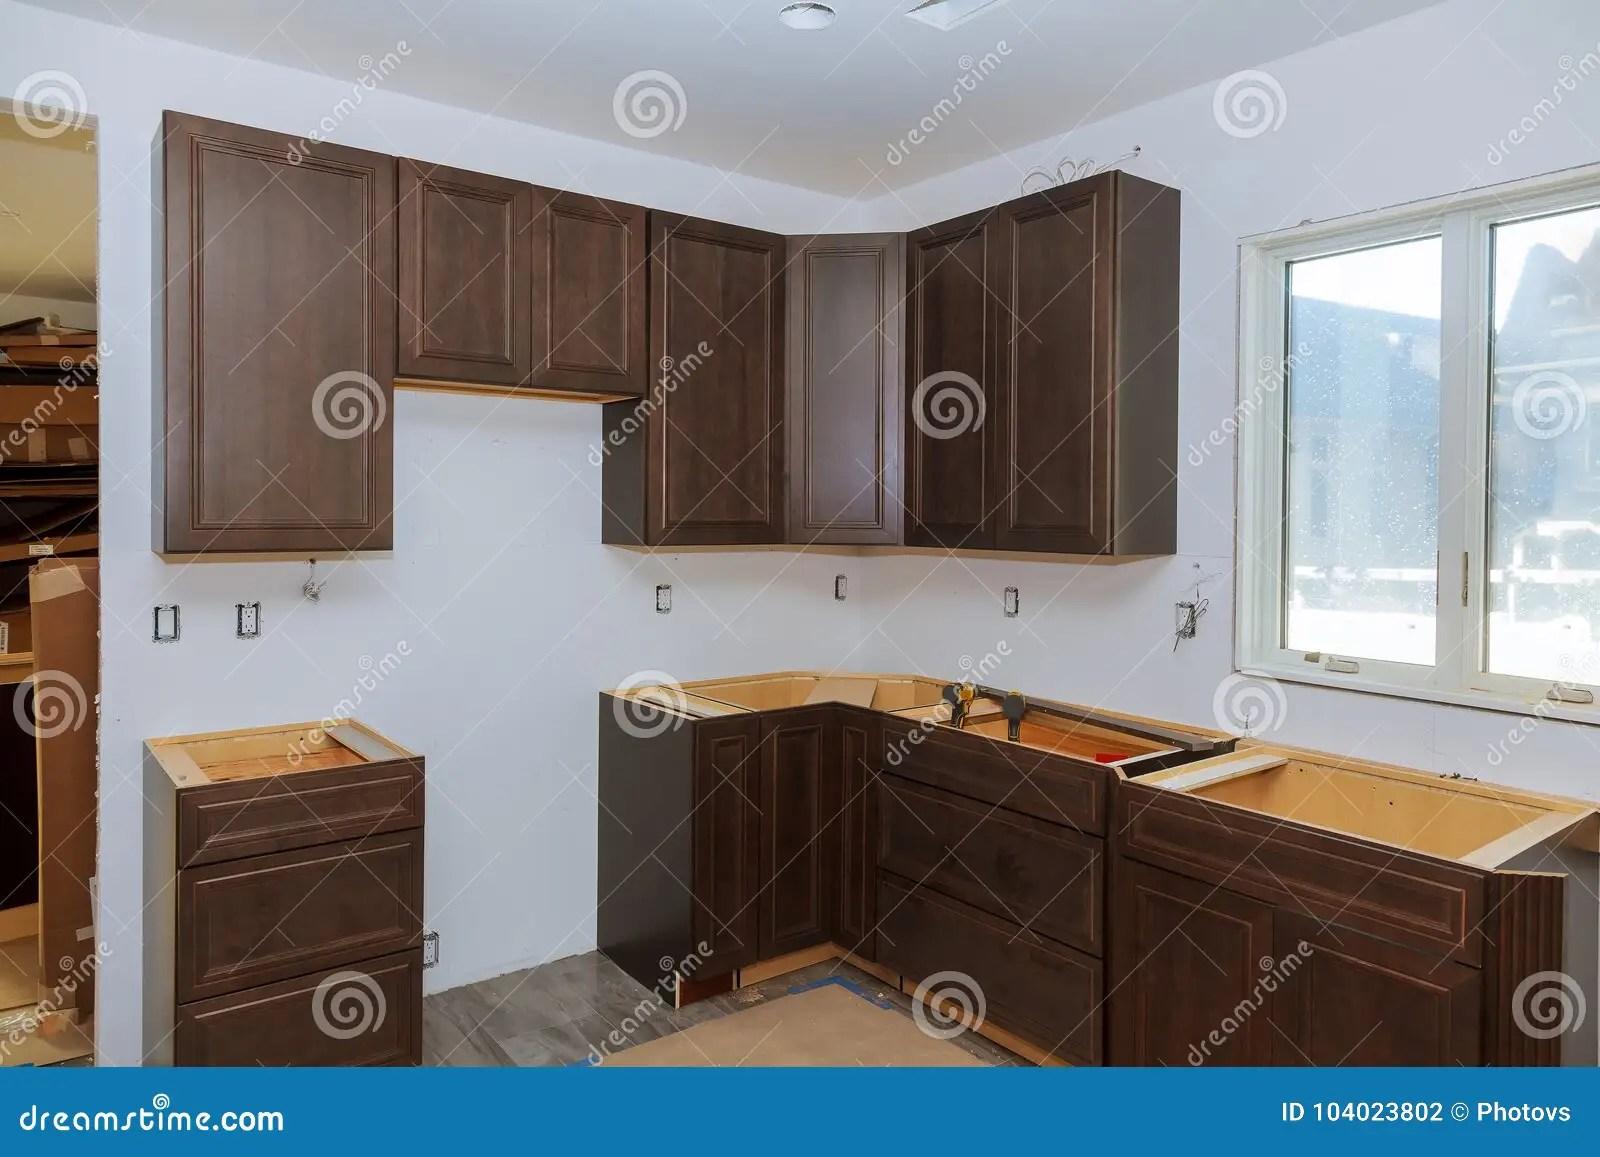 base kitchen cabinets compost container 习惯厨柜以设施基地各种各样的阶段海岛的在中心库存照片 图片包括有笤帚 习惯厨柜以设施基地各种各样的阶段海岛的在中心